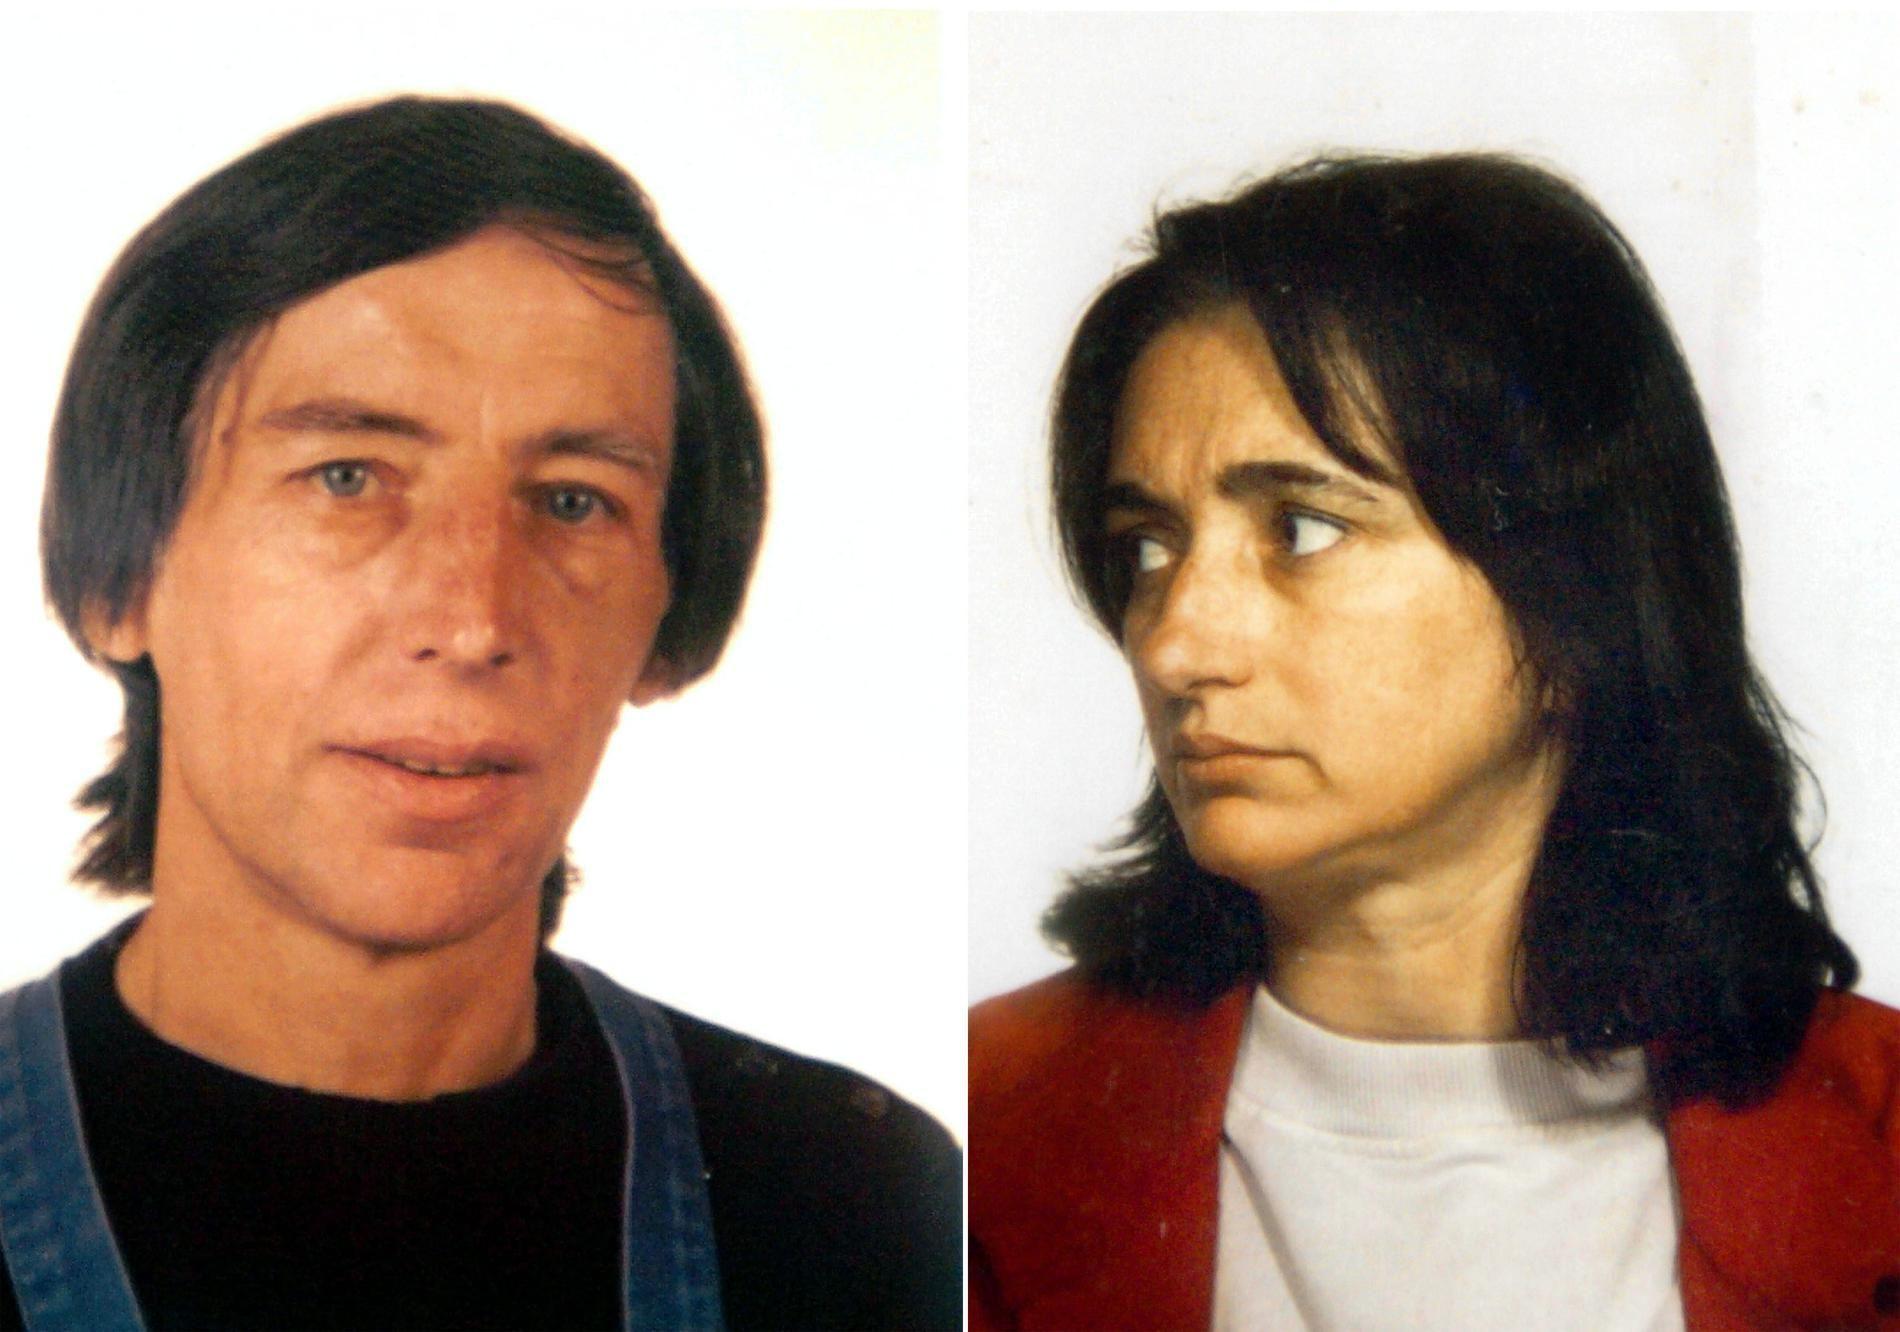 Michel Fourniret et Monique Olivier Monique Olivier est ...